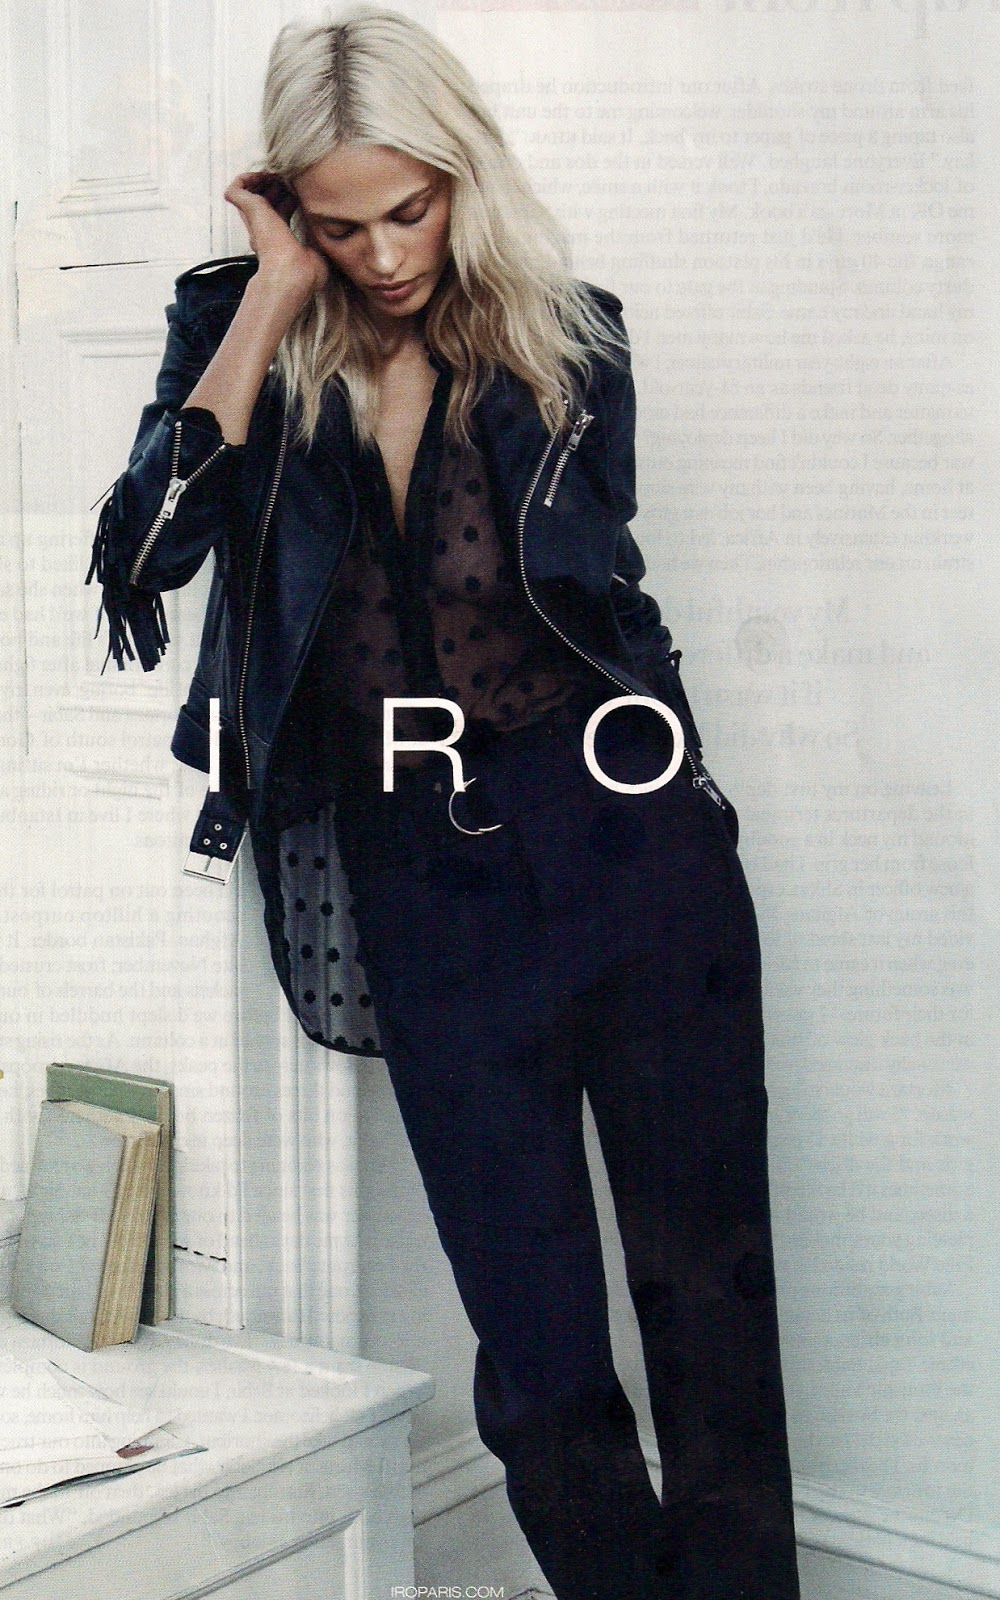 IRO black leather jacket and black pants